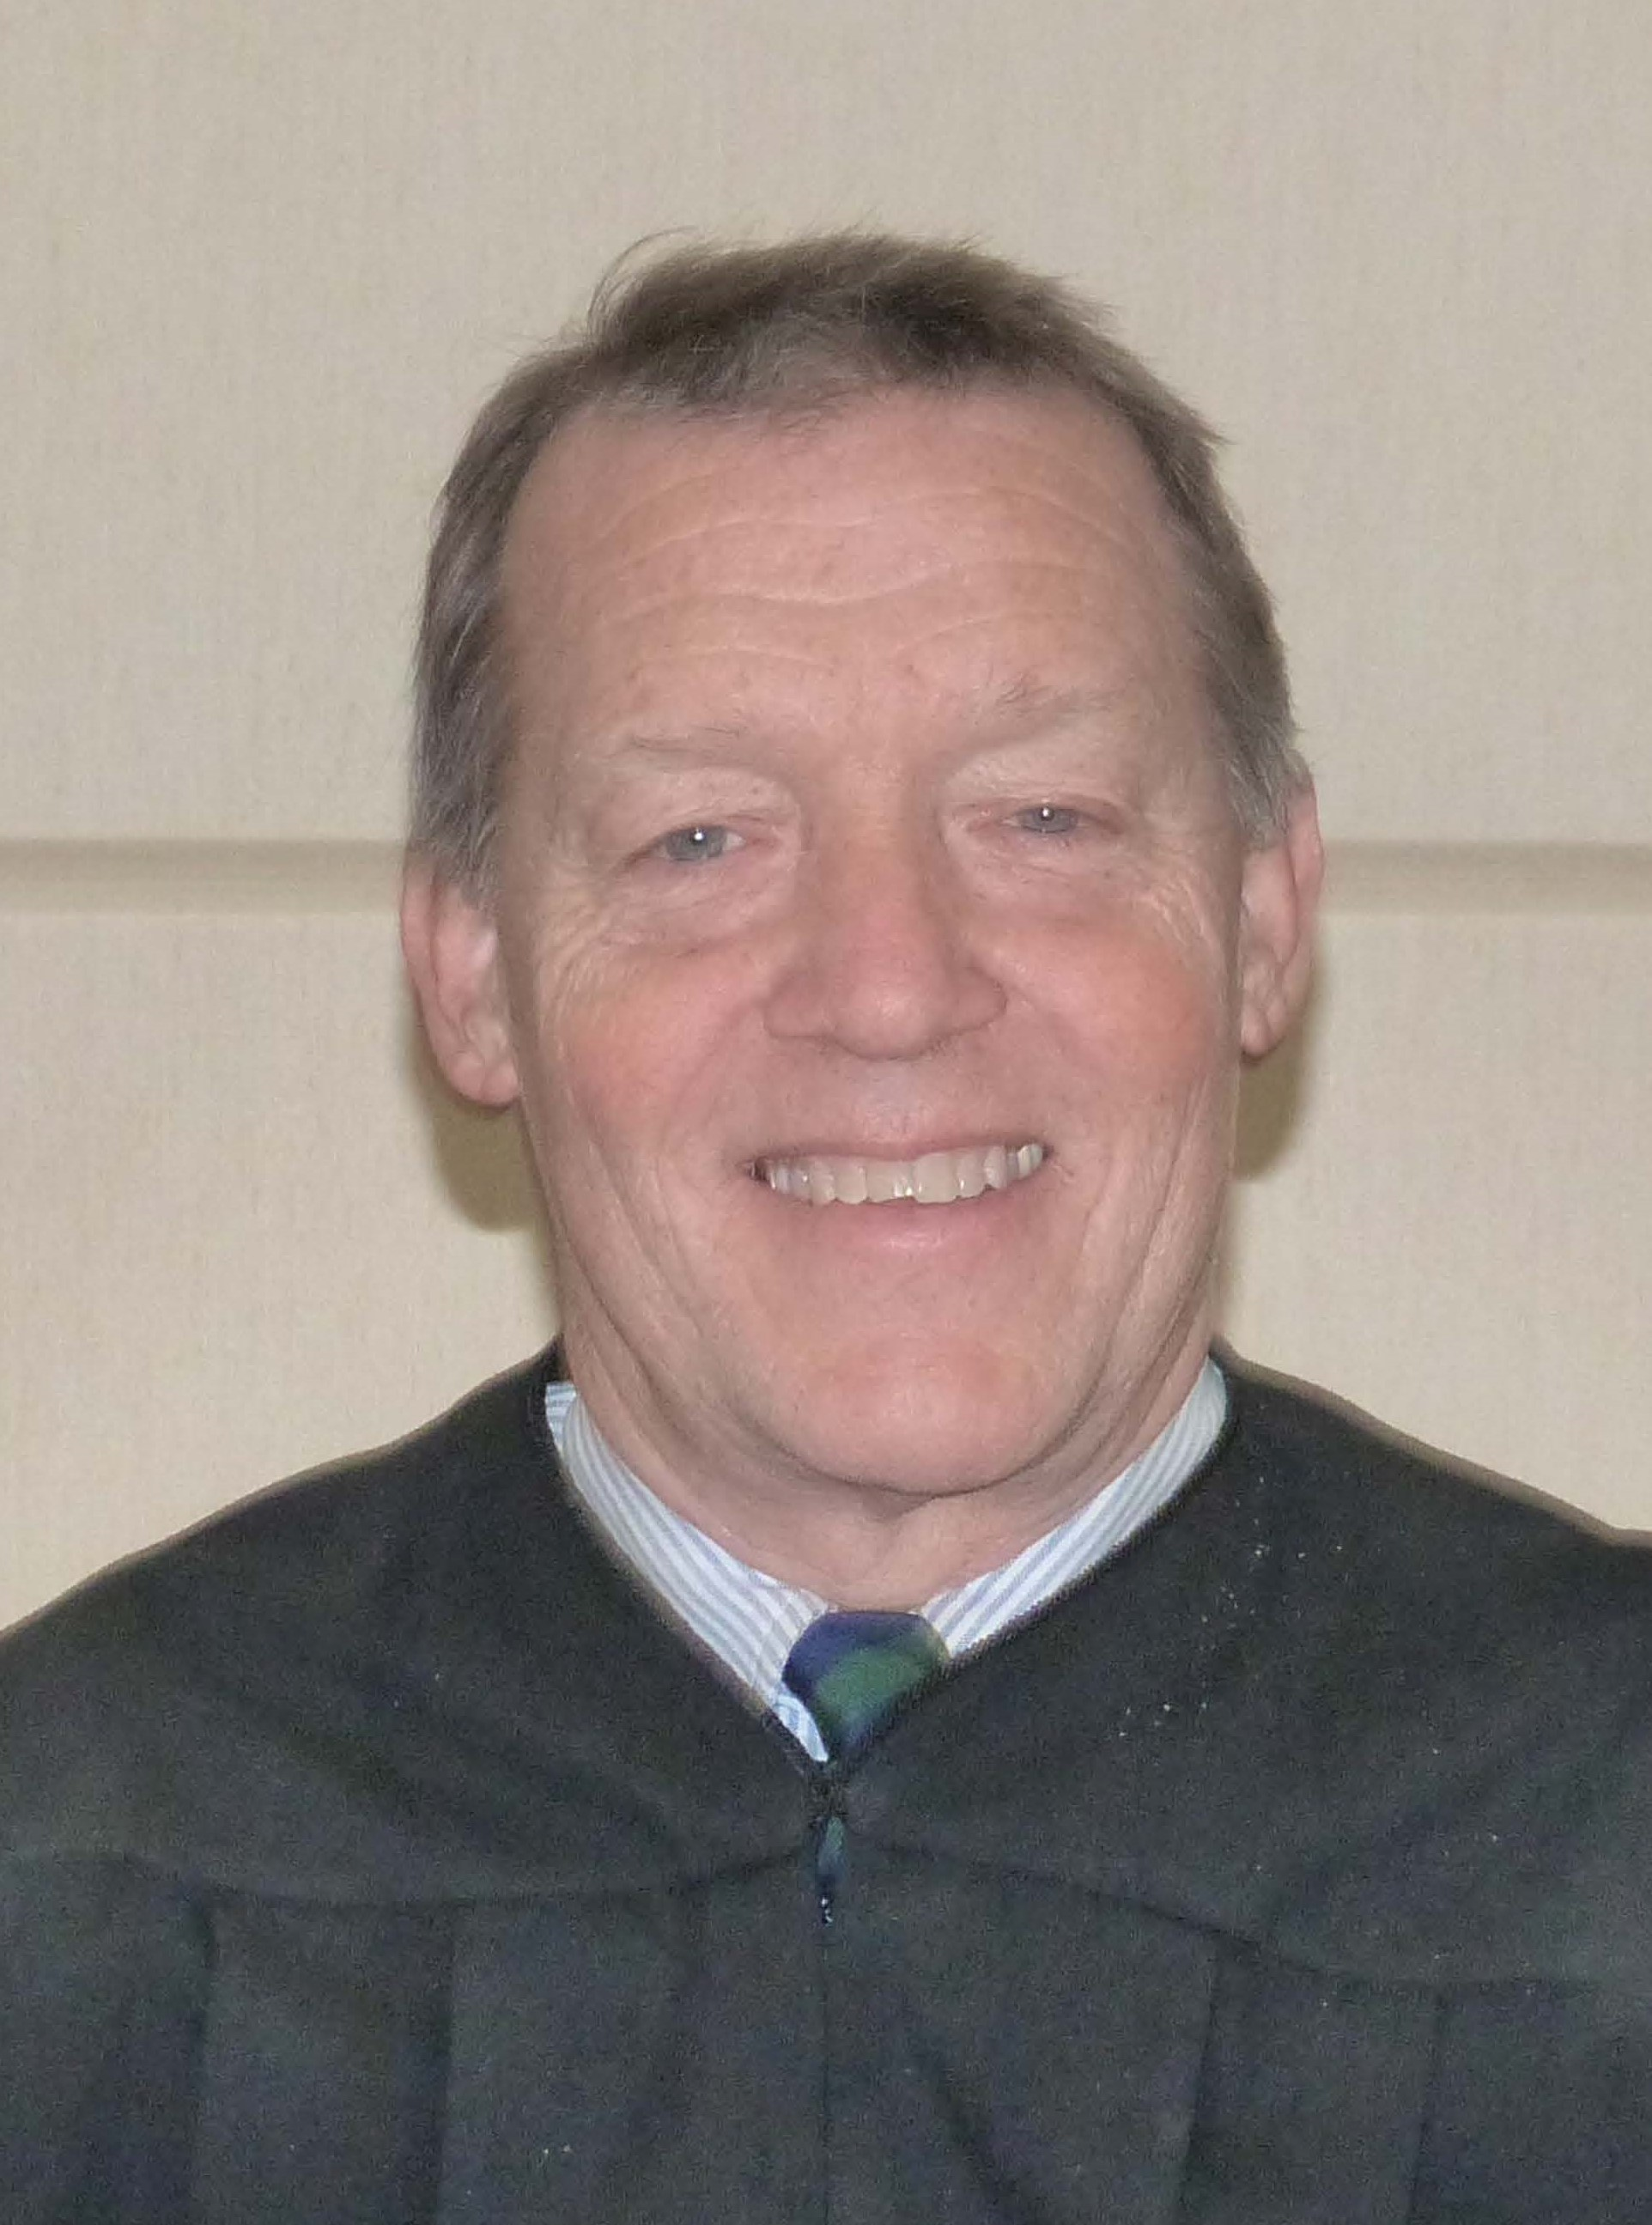 Alan Albright